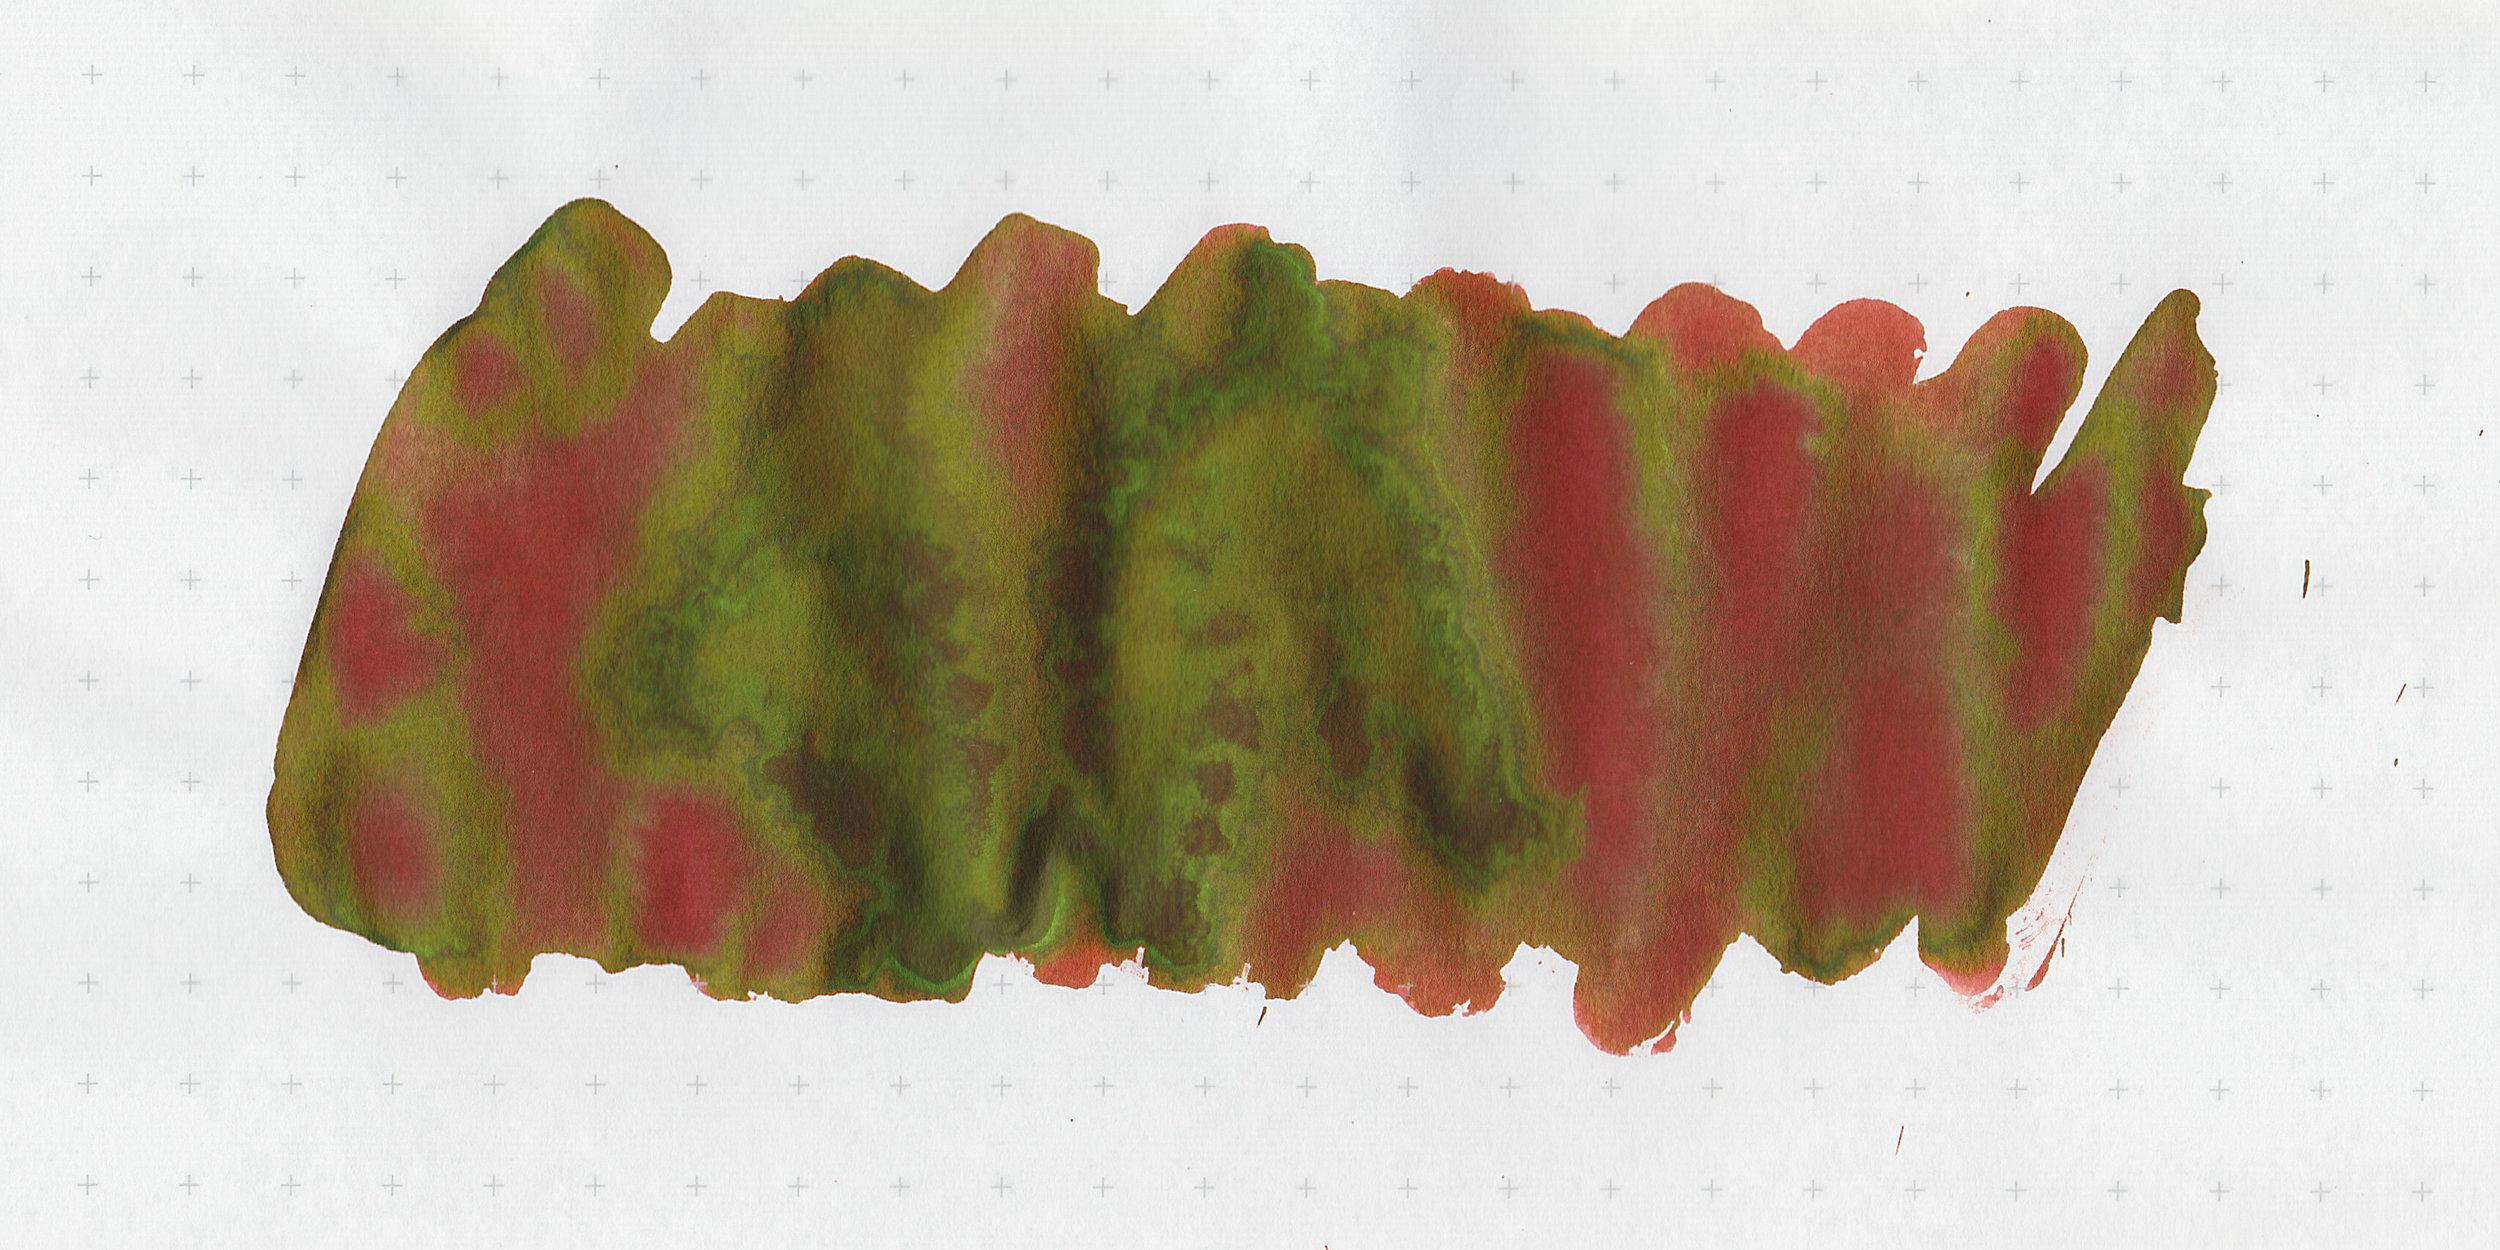 kri-jungle-volcano-12.jpg